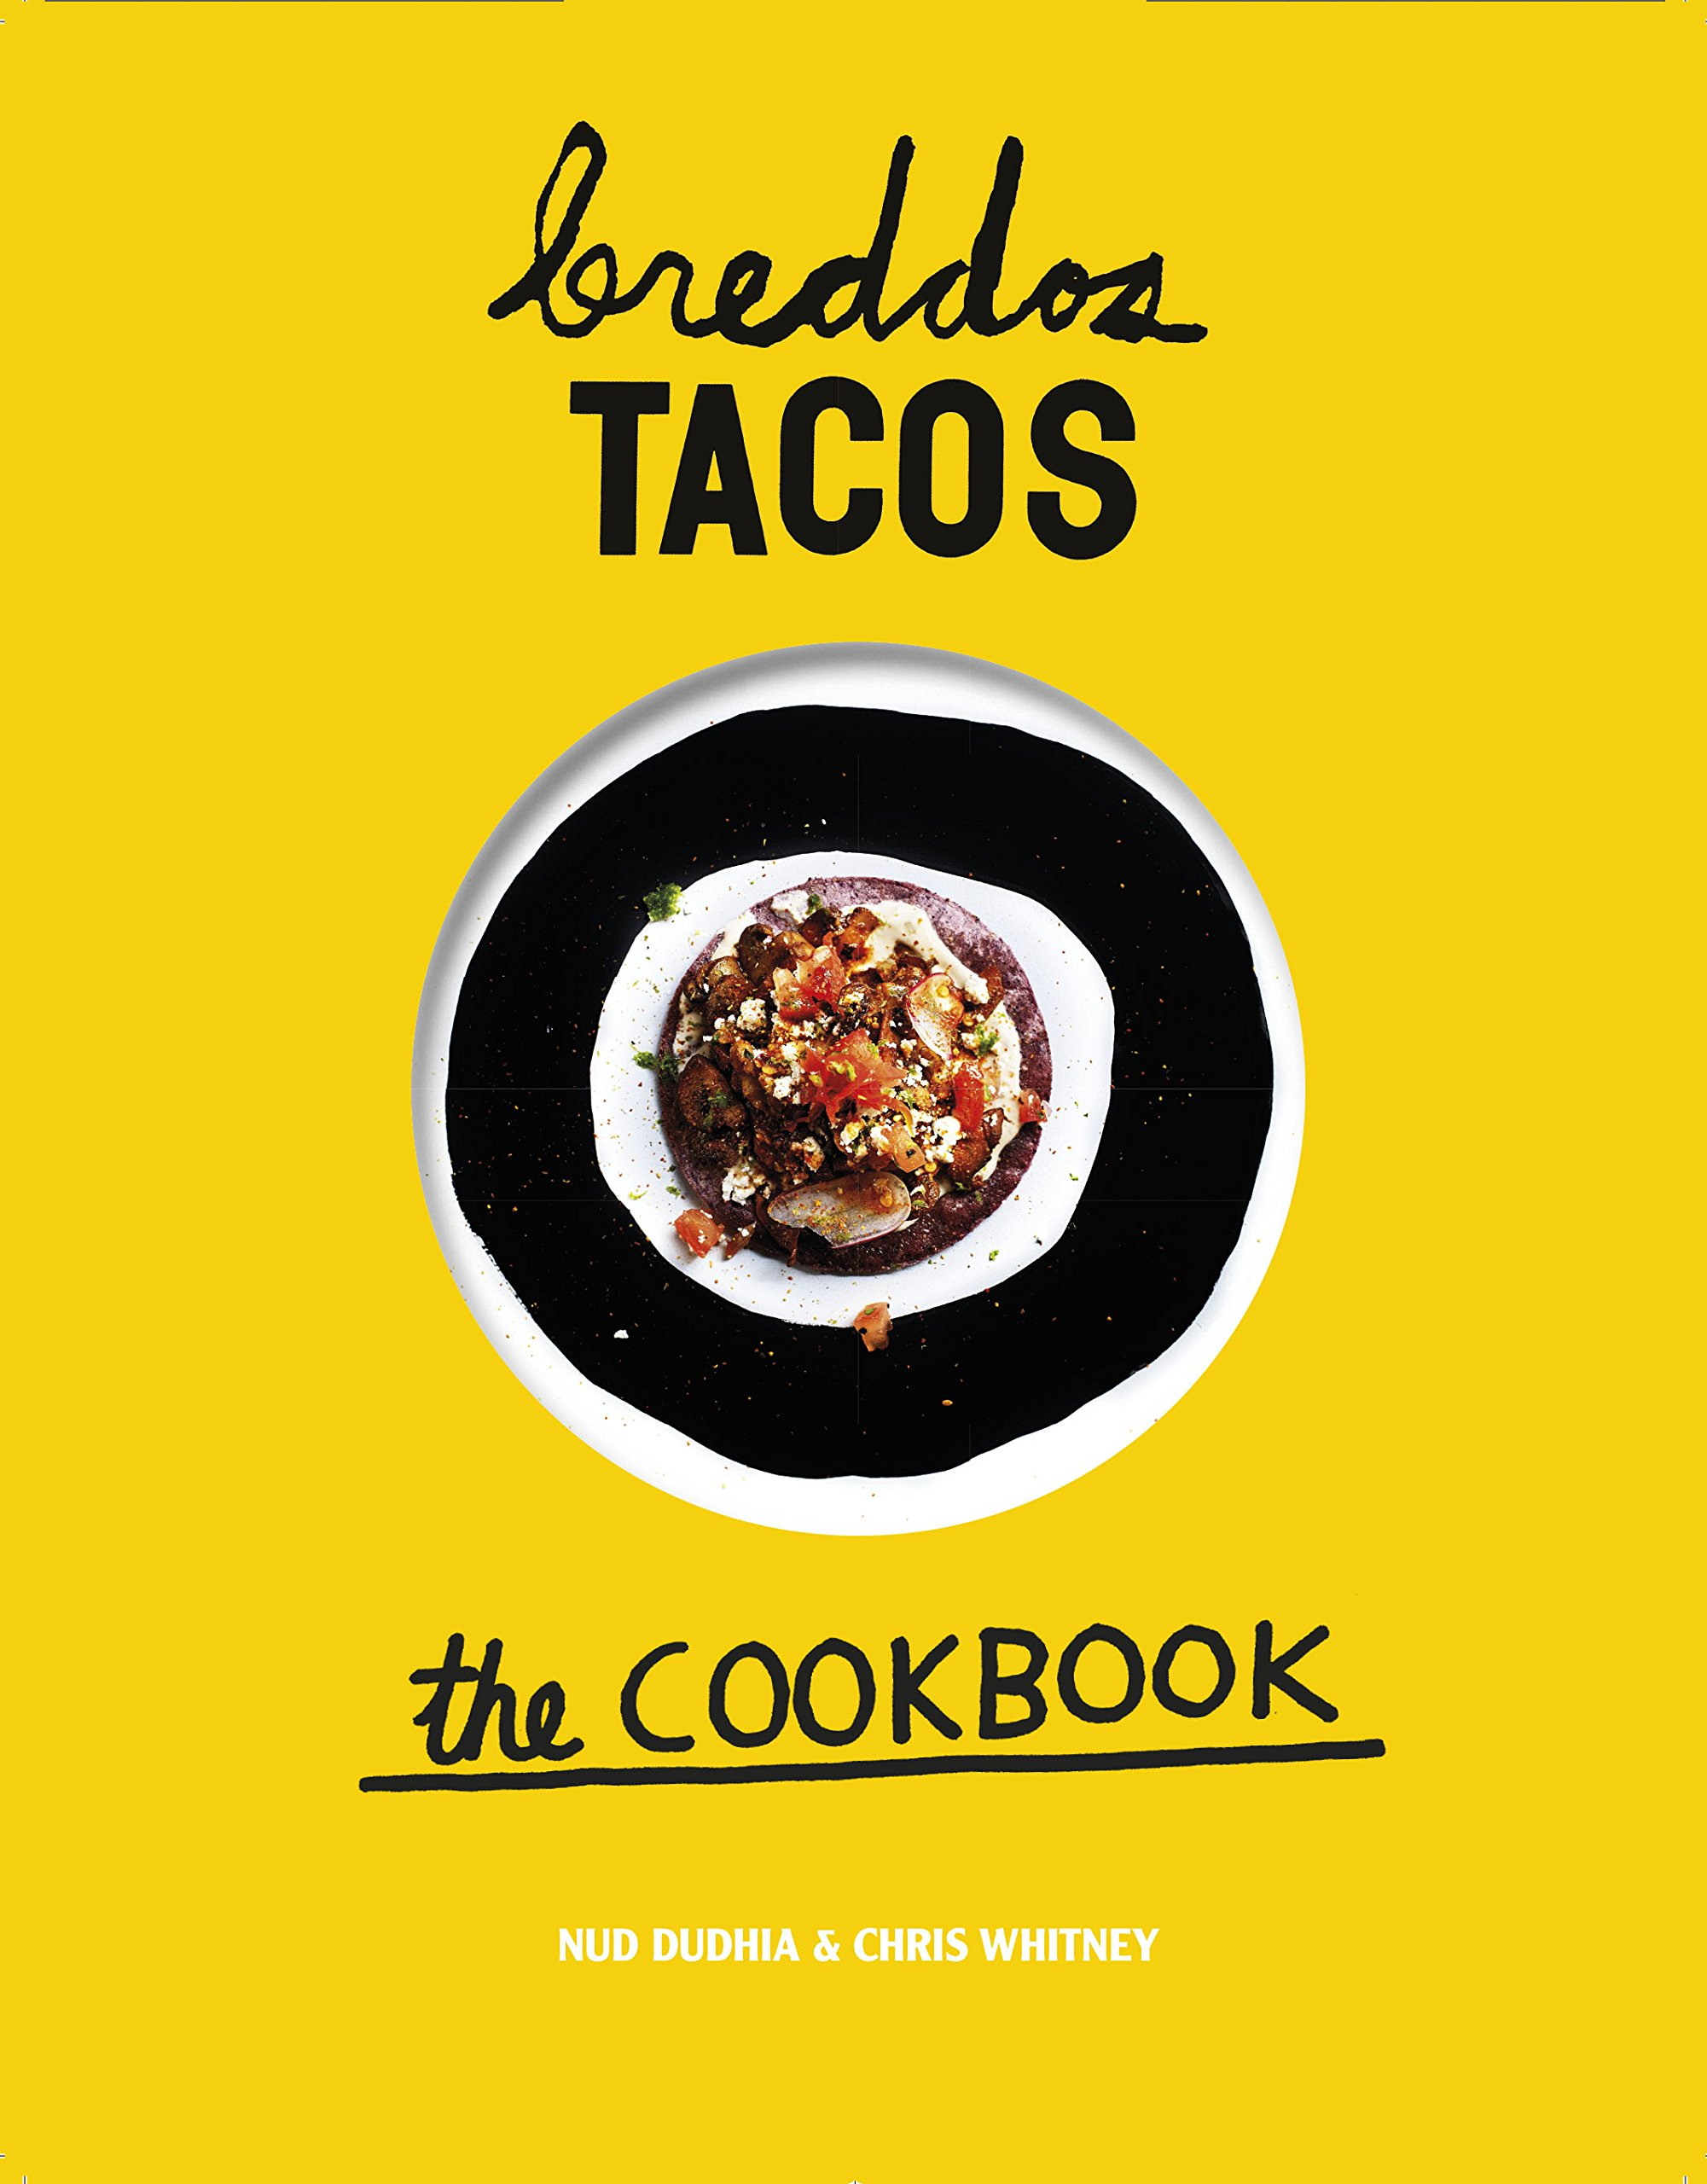 breddos Tacos: The Cookbook: Epic Edible Plates: Nud Dudhia, Chris Whitney, Kris Kirkham: 9781849497992: Amazon.com: Books